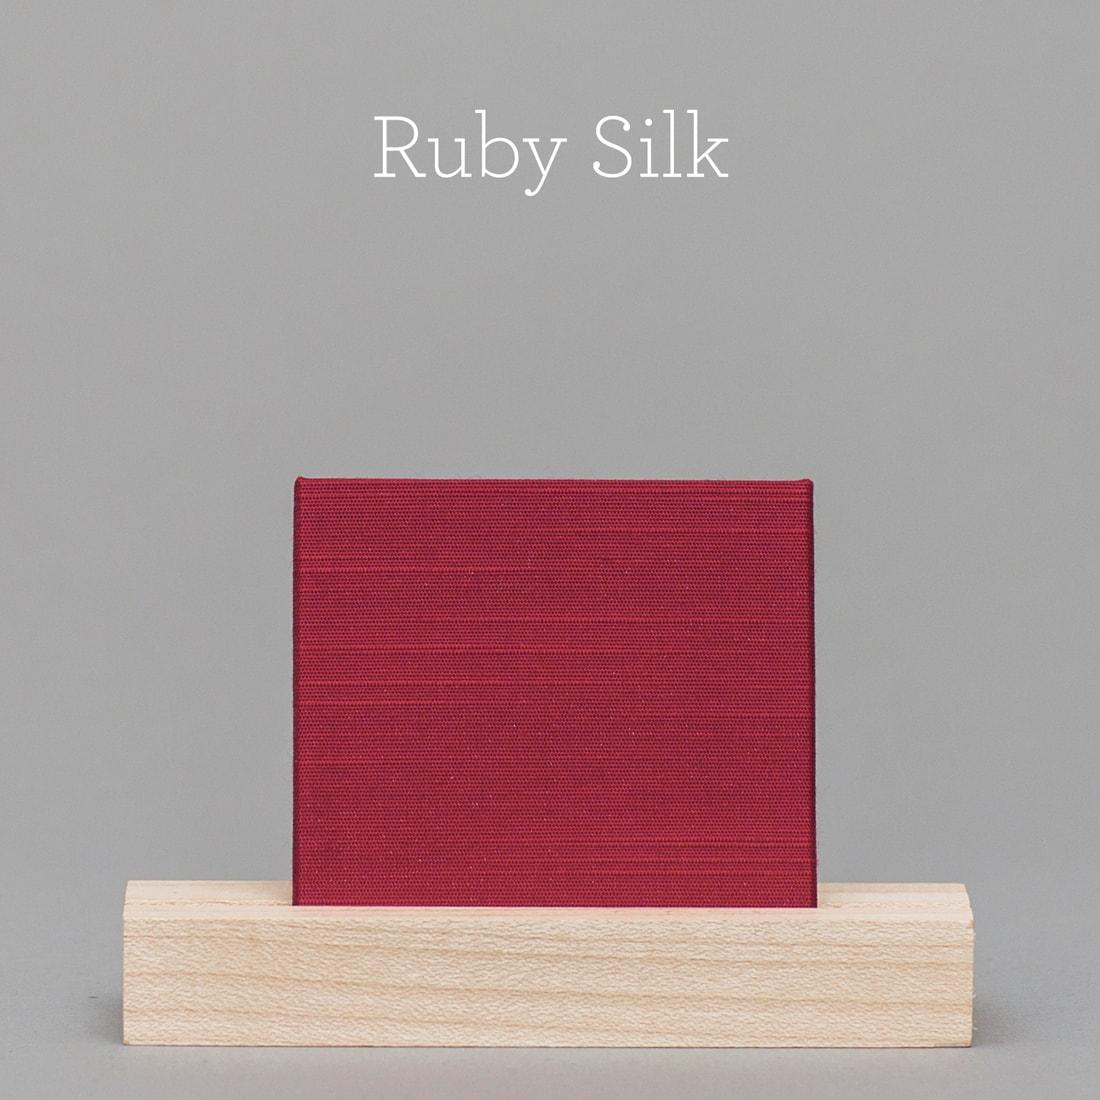 RubySilk.jpg